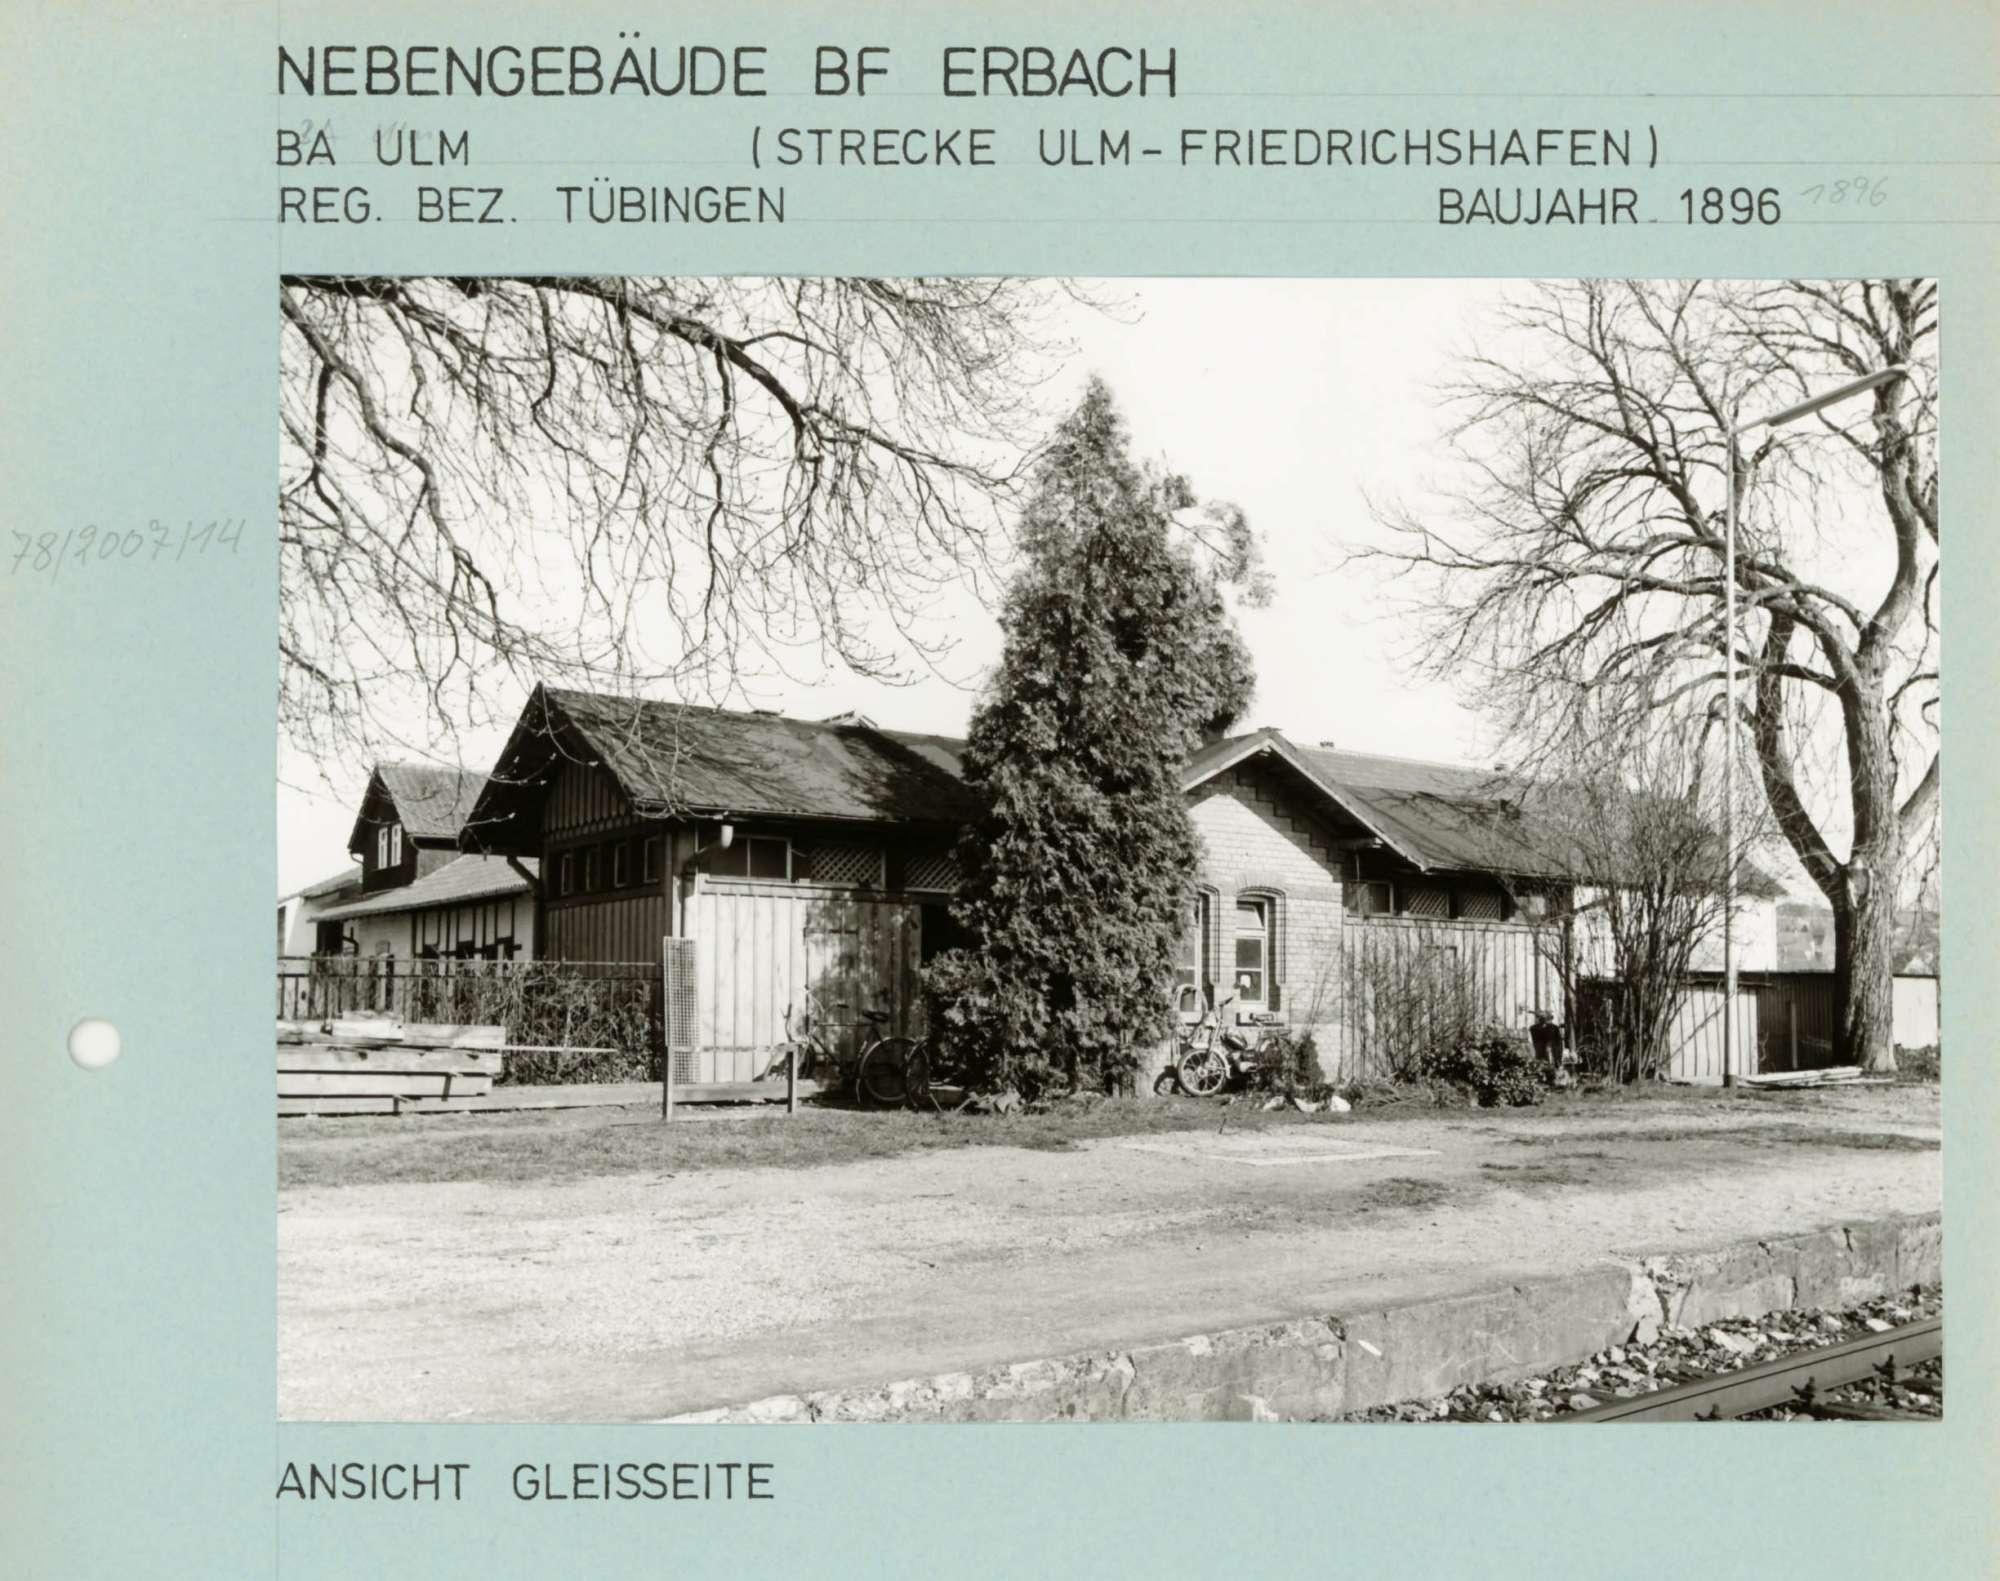 Erbach: 6 Fotos u.a., Bild 3